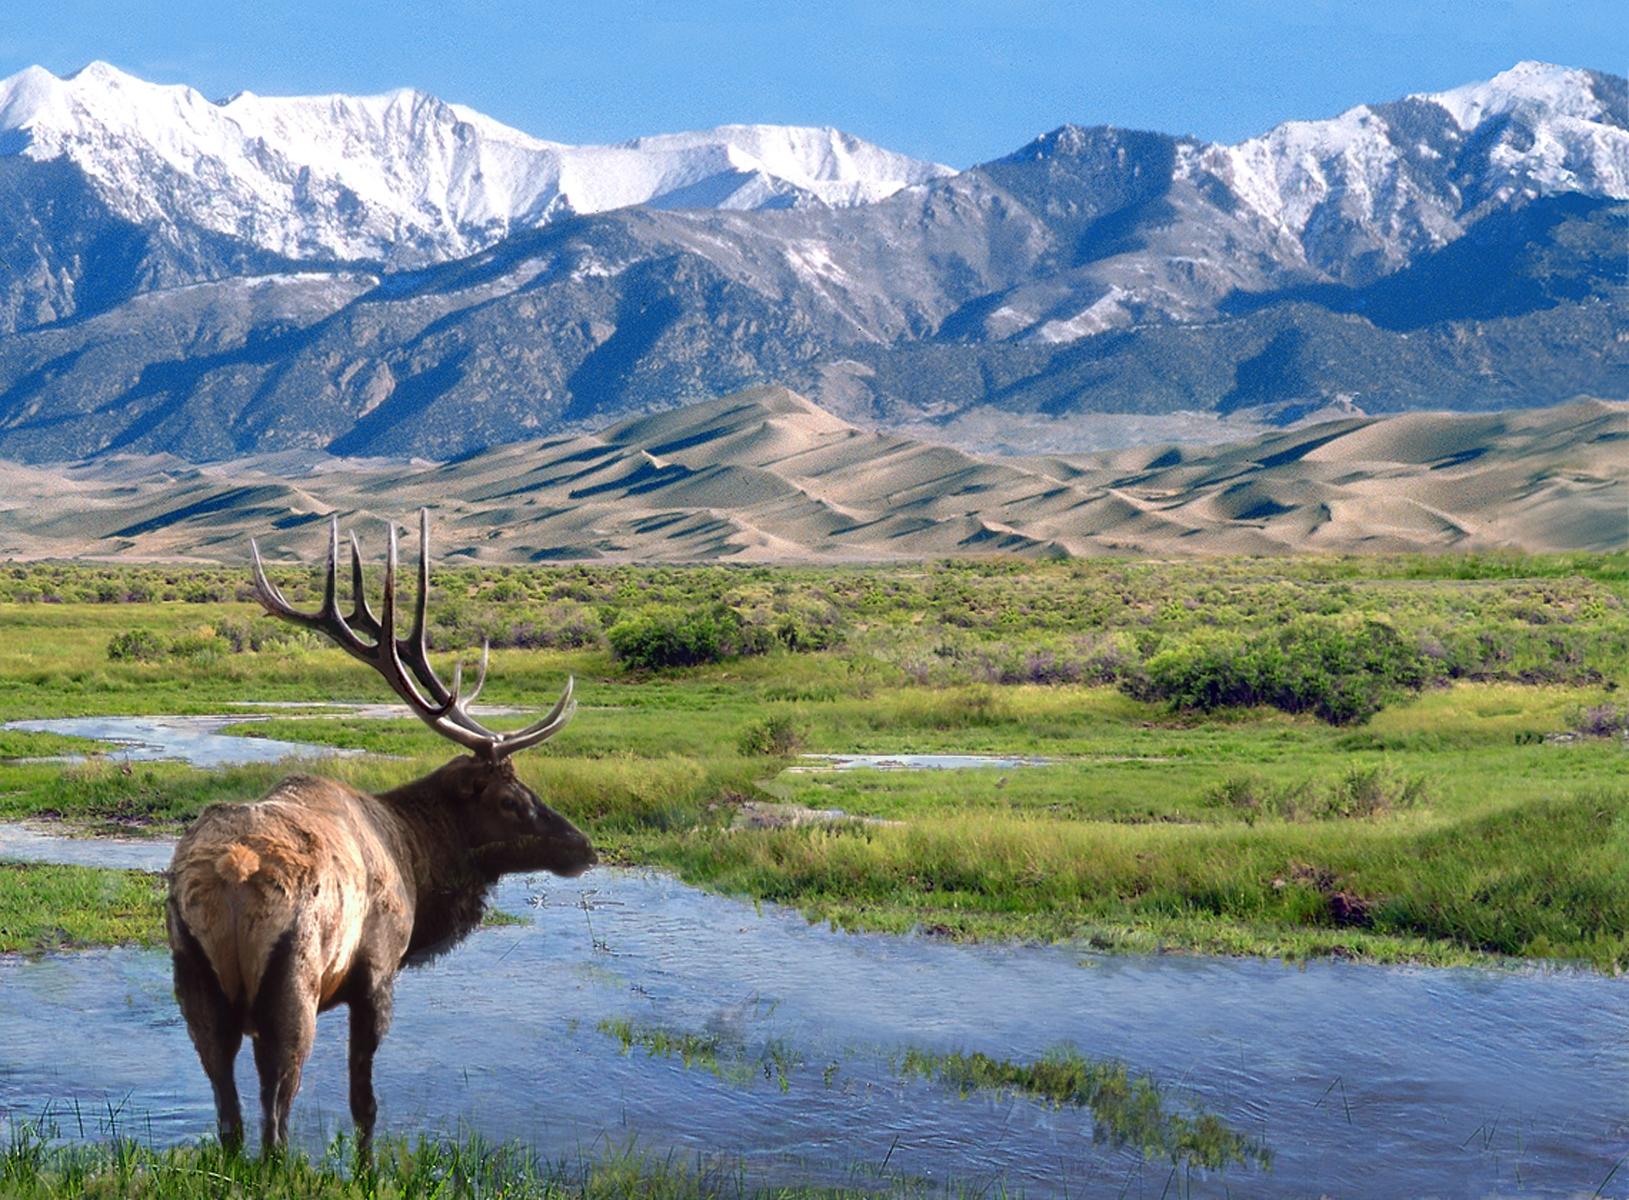 Moose, Water, Grass, Sand Dunes, Mountains